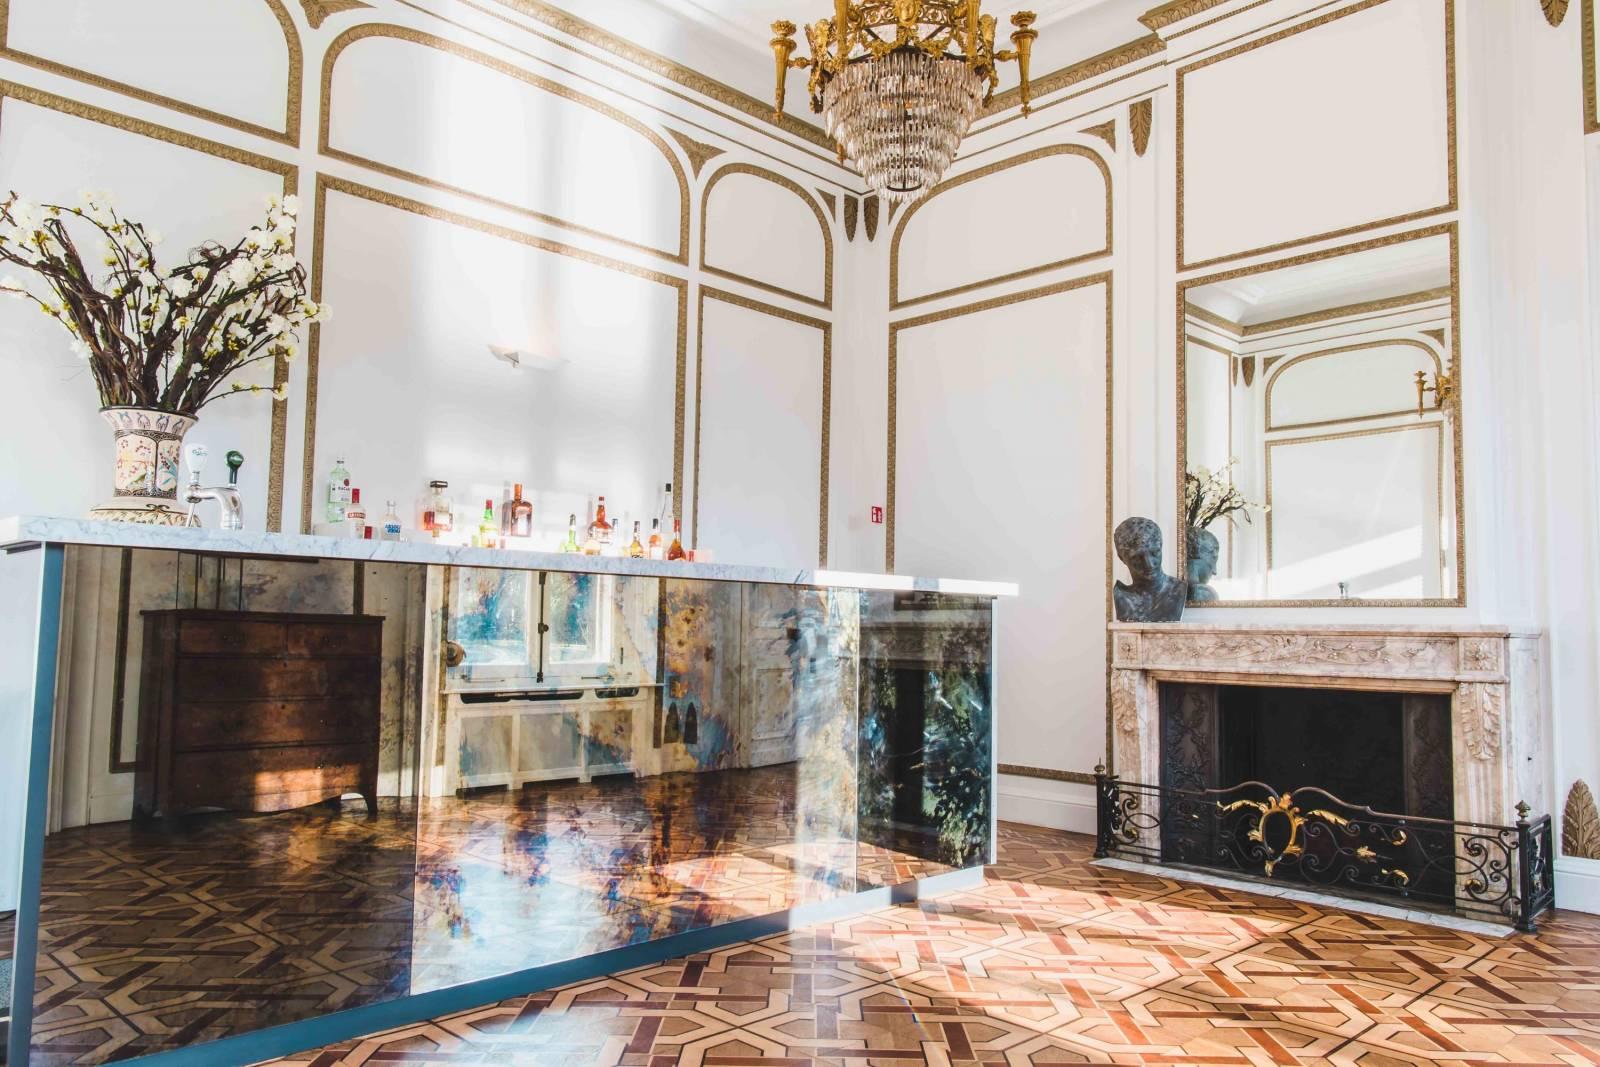 Kasteel Den Brandt - Feestzaal - Trouwzaal - Kasteel - House of Weddings - 35